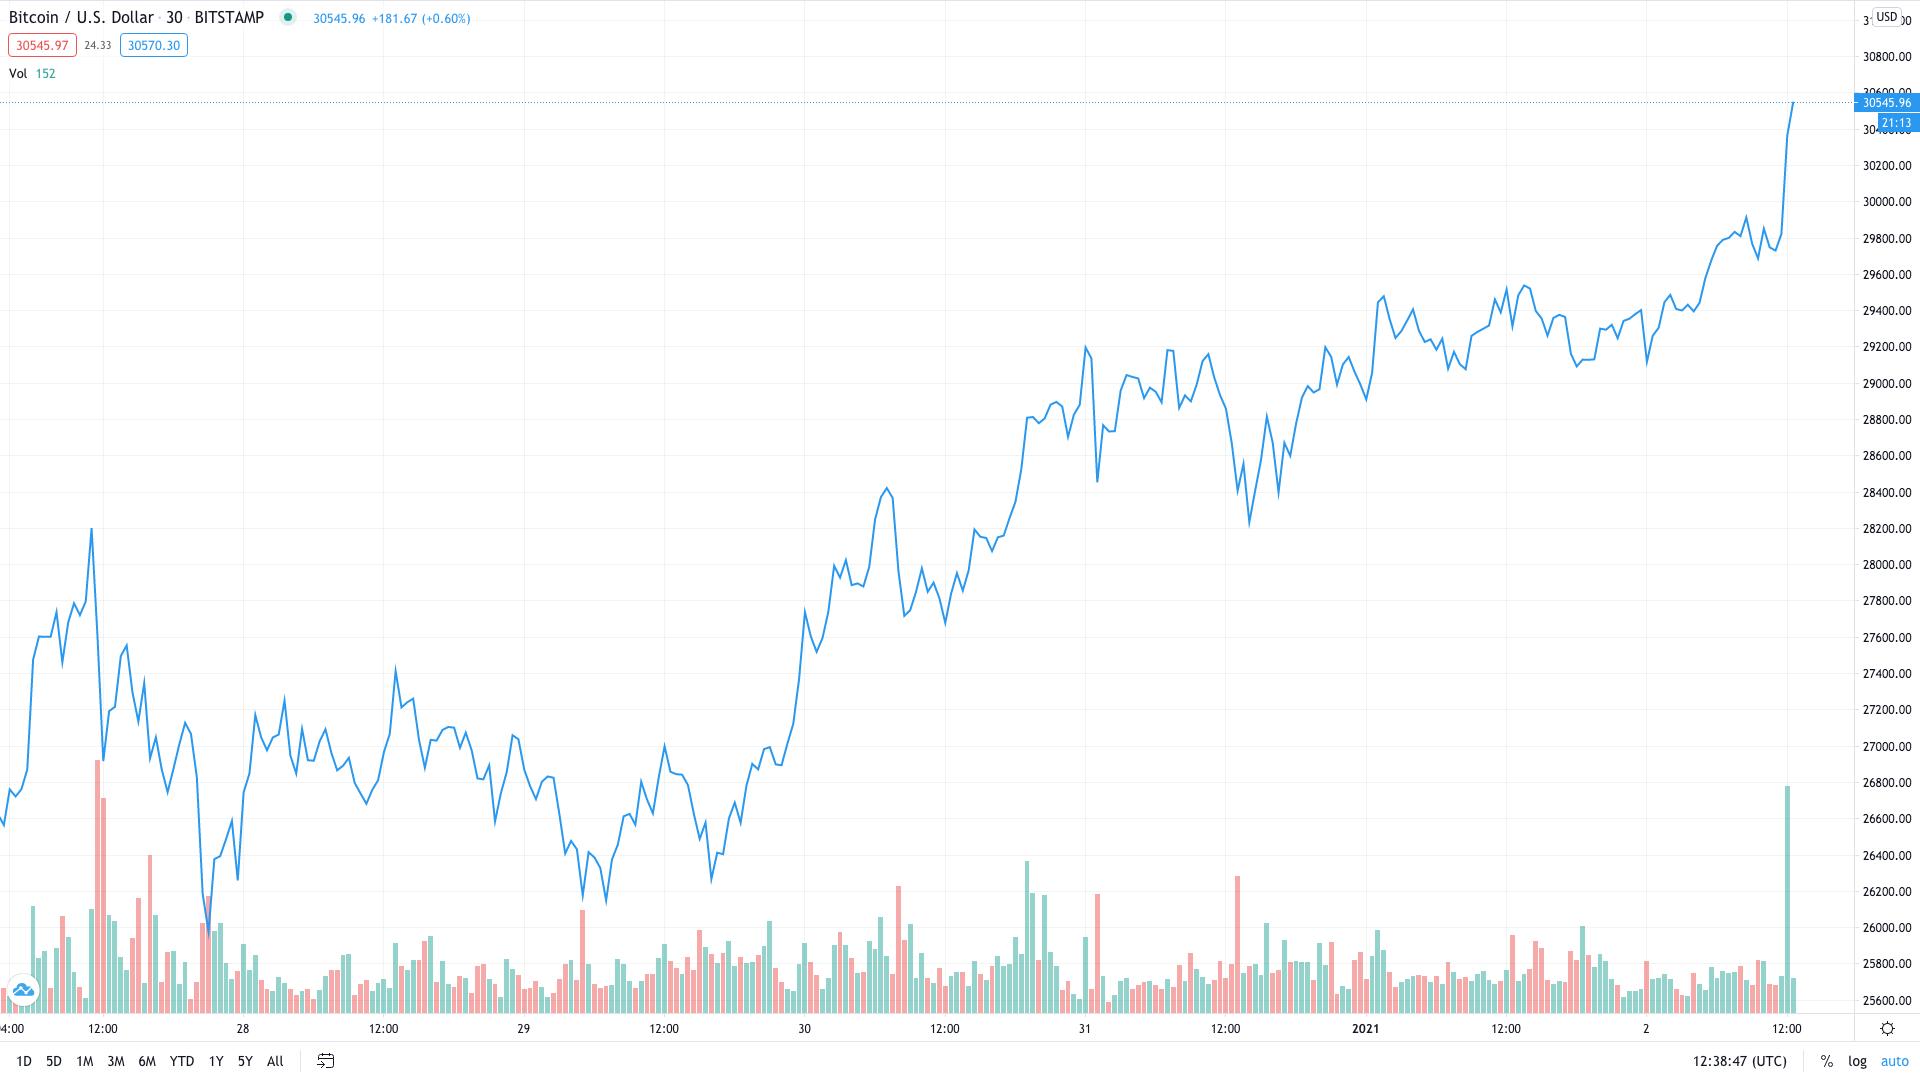 Bitcoin all-time high